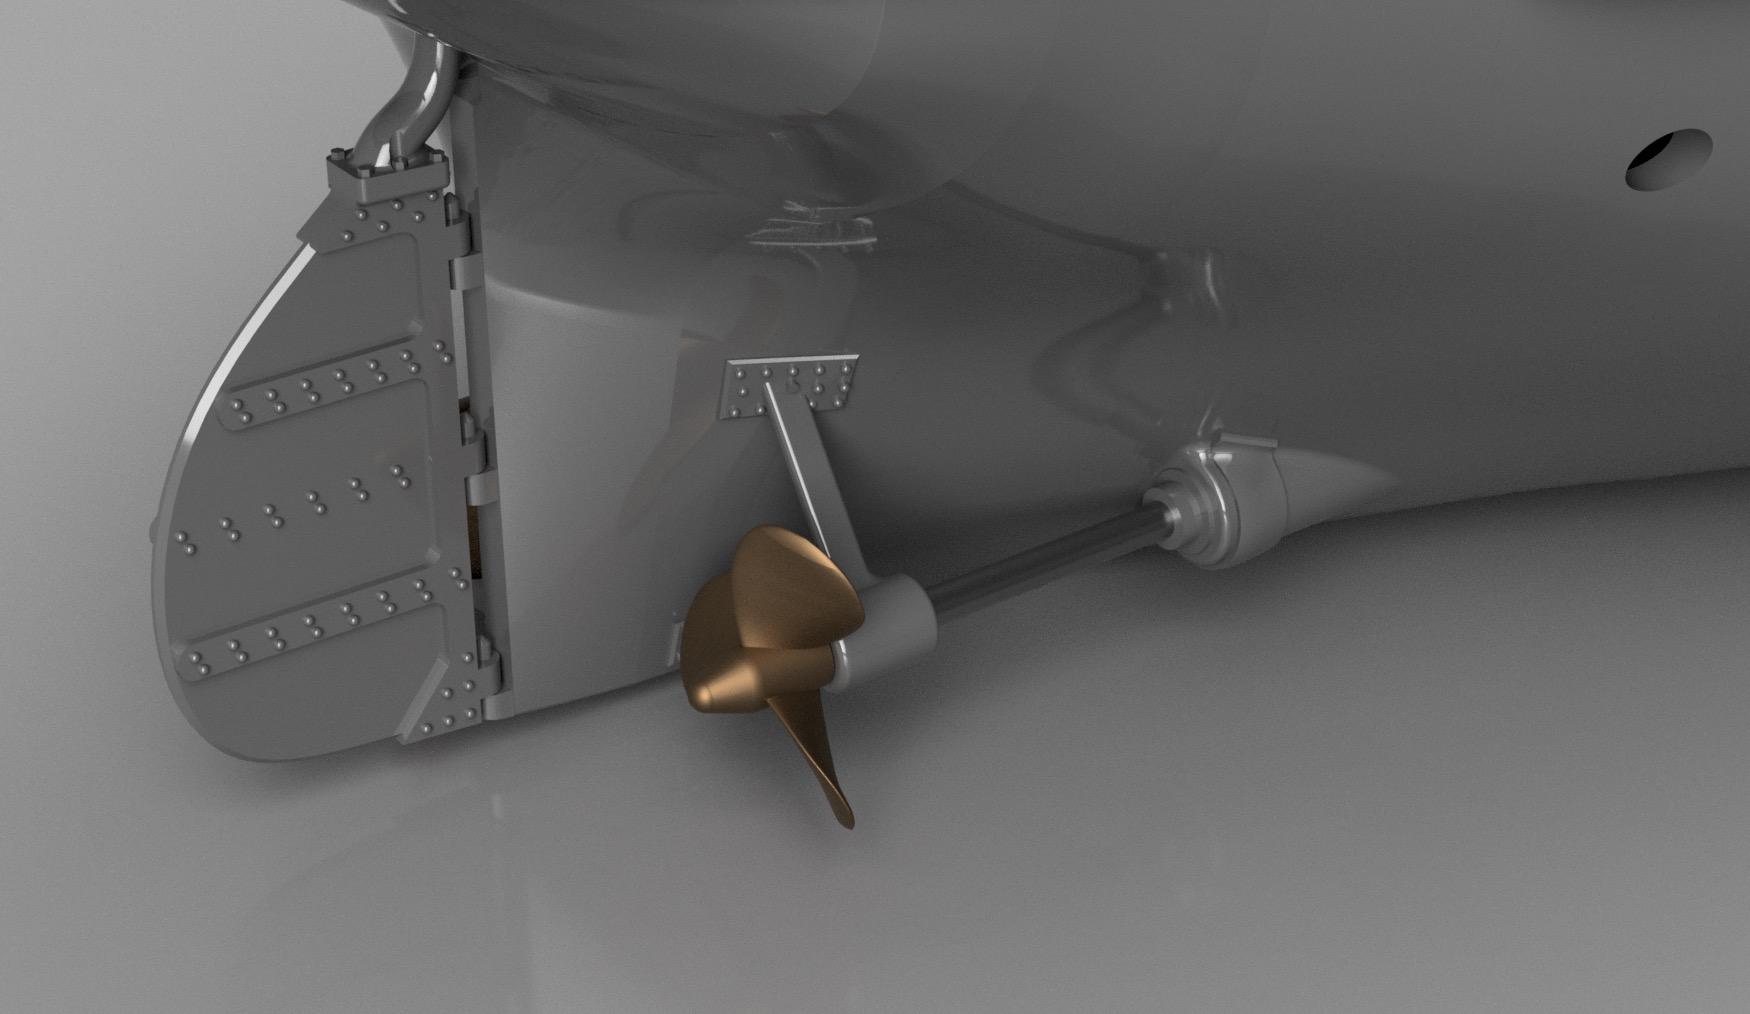 SS Nomadic (Modélisation 3D 1/200°) par Iceman29 - Page 4 Screen47